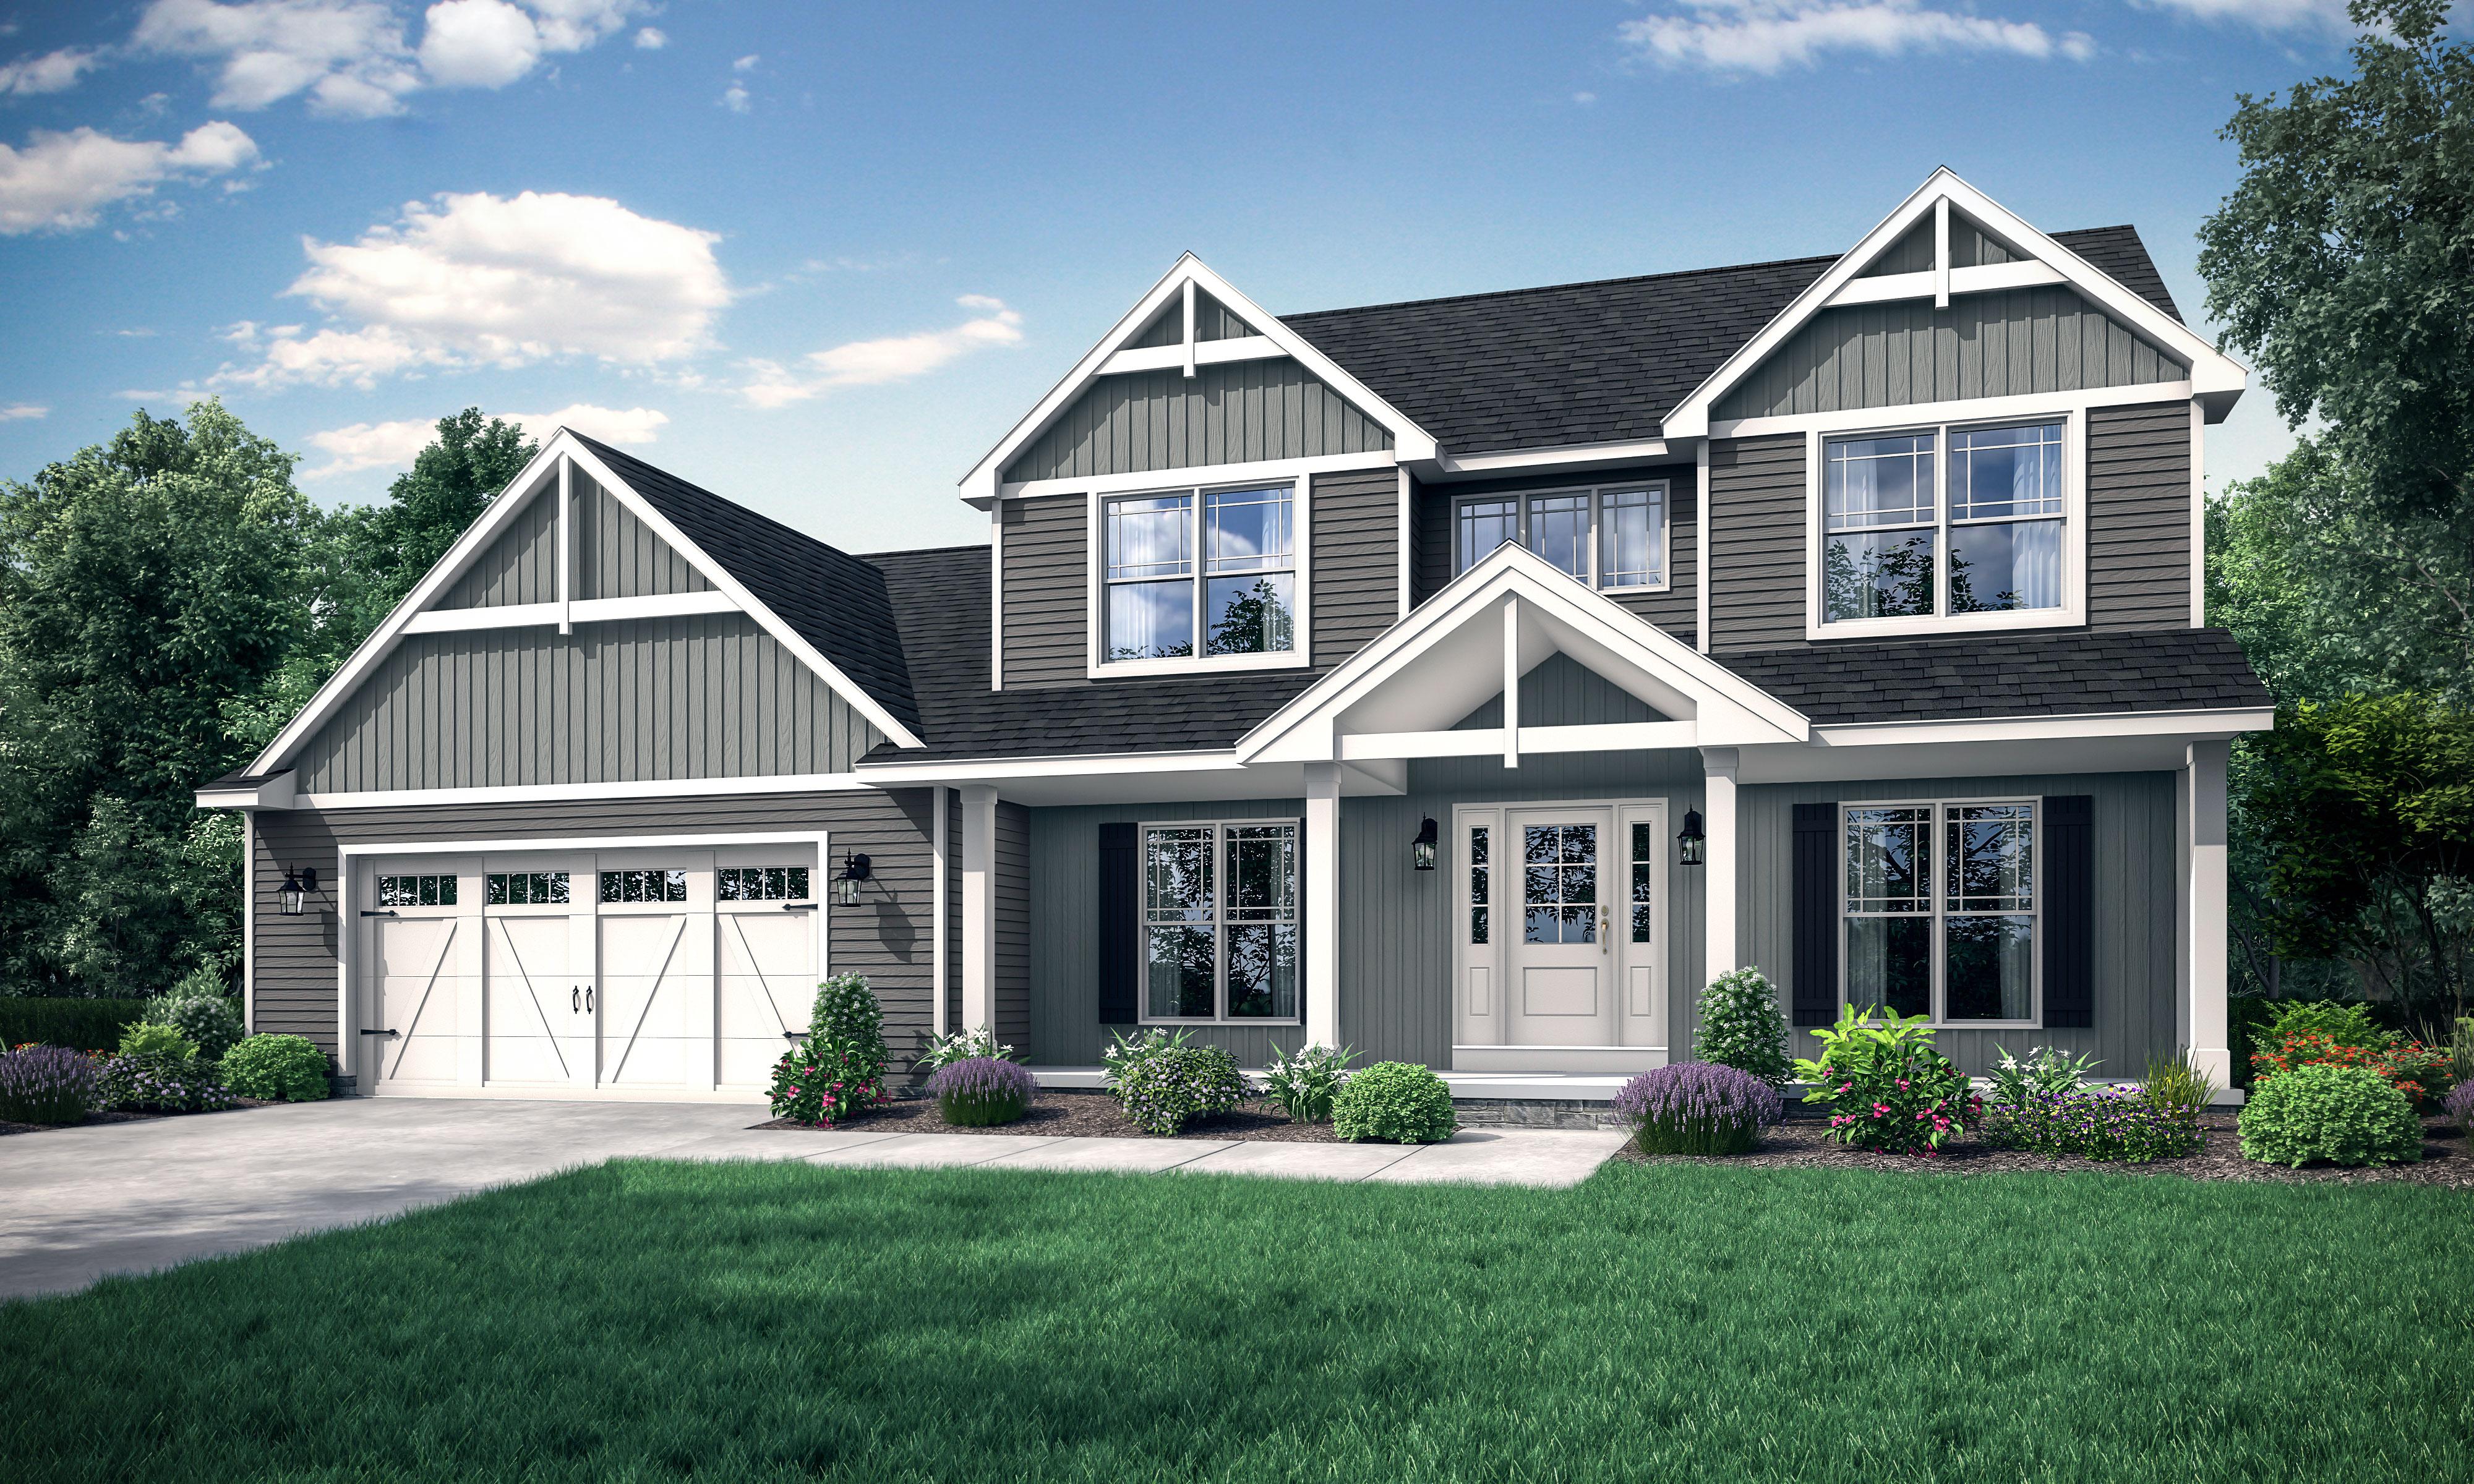 Wayne Homes Announces Construction Of New Model At Sunbury